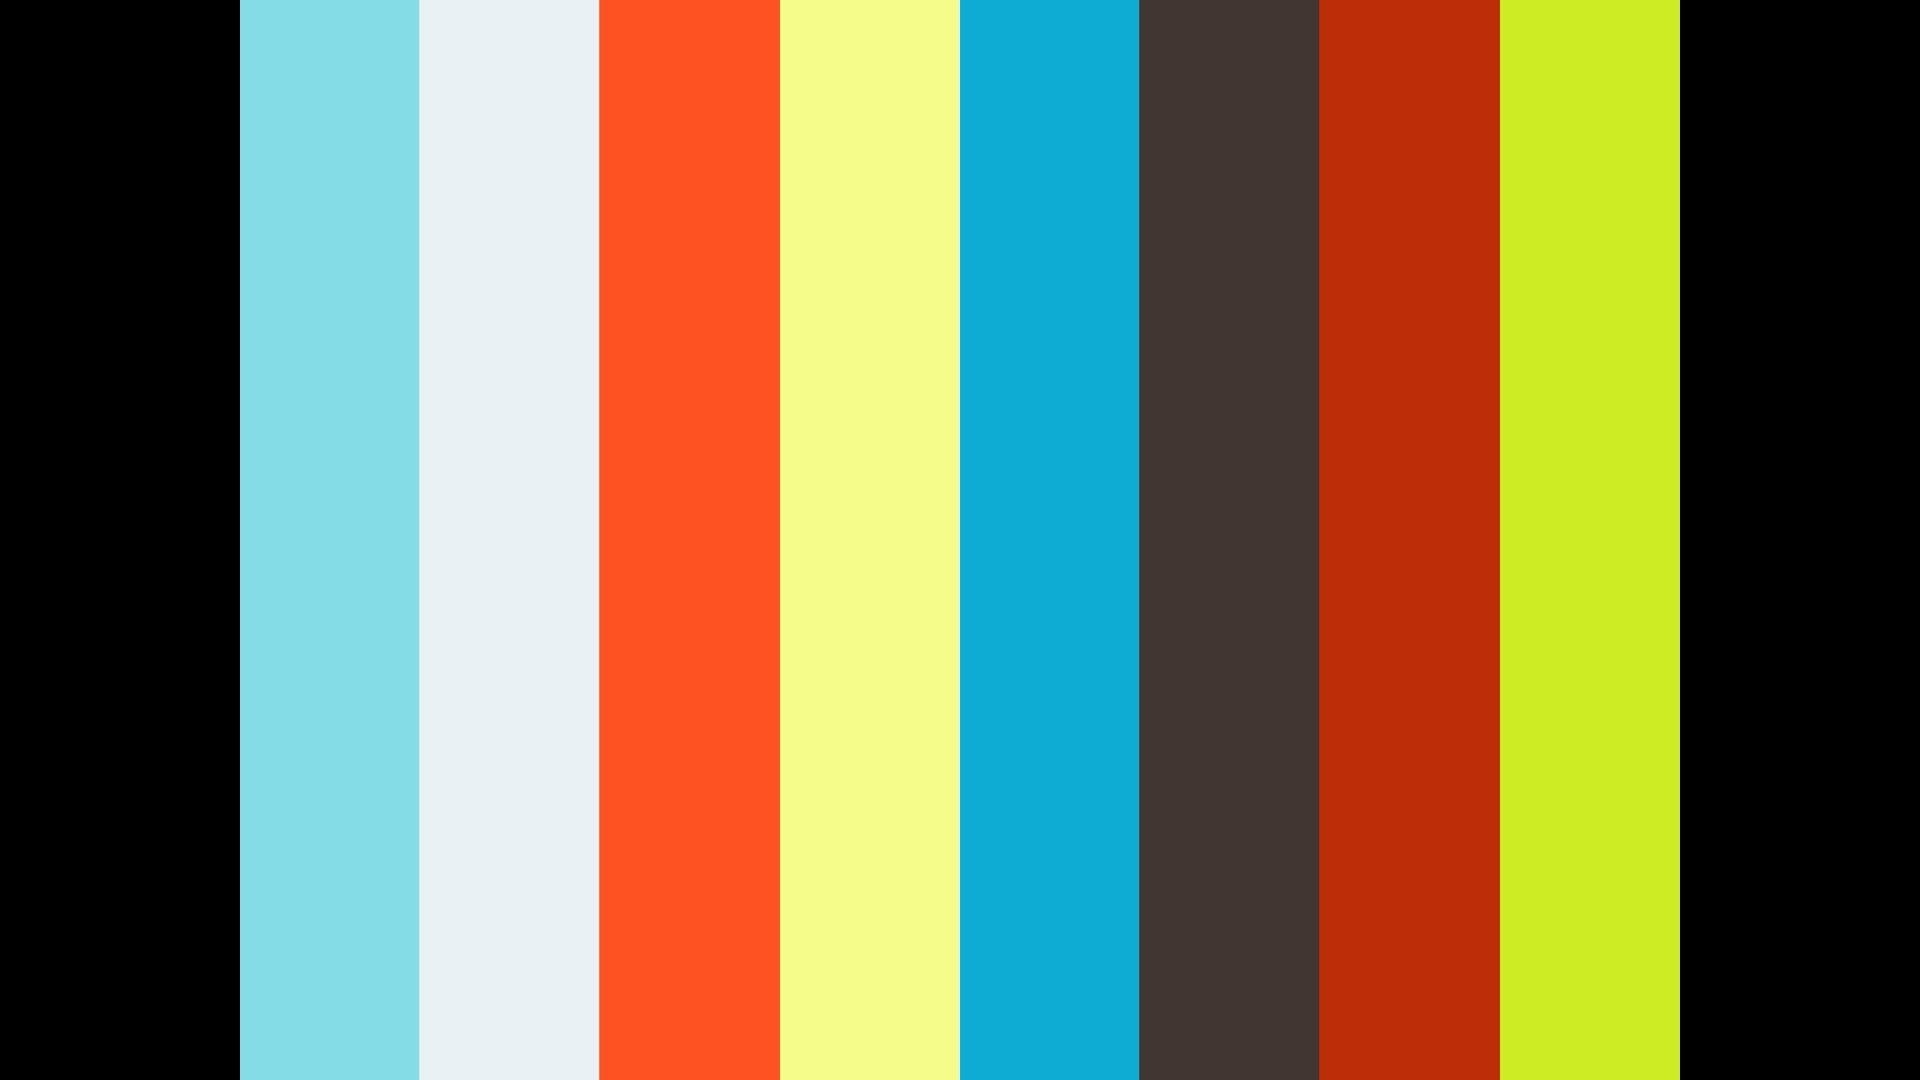 2020-06-20- ILOT TERE - SKYVIEW -NC